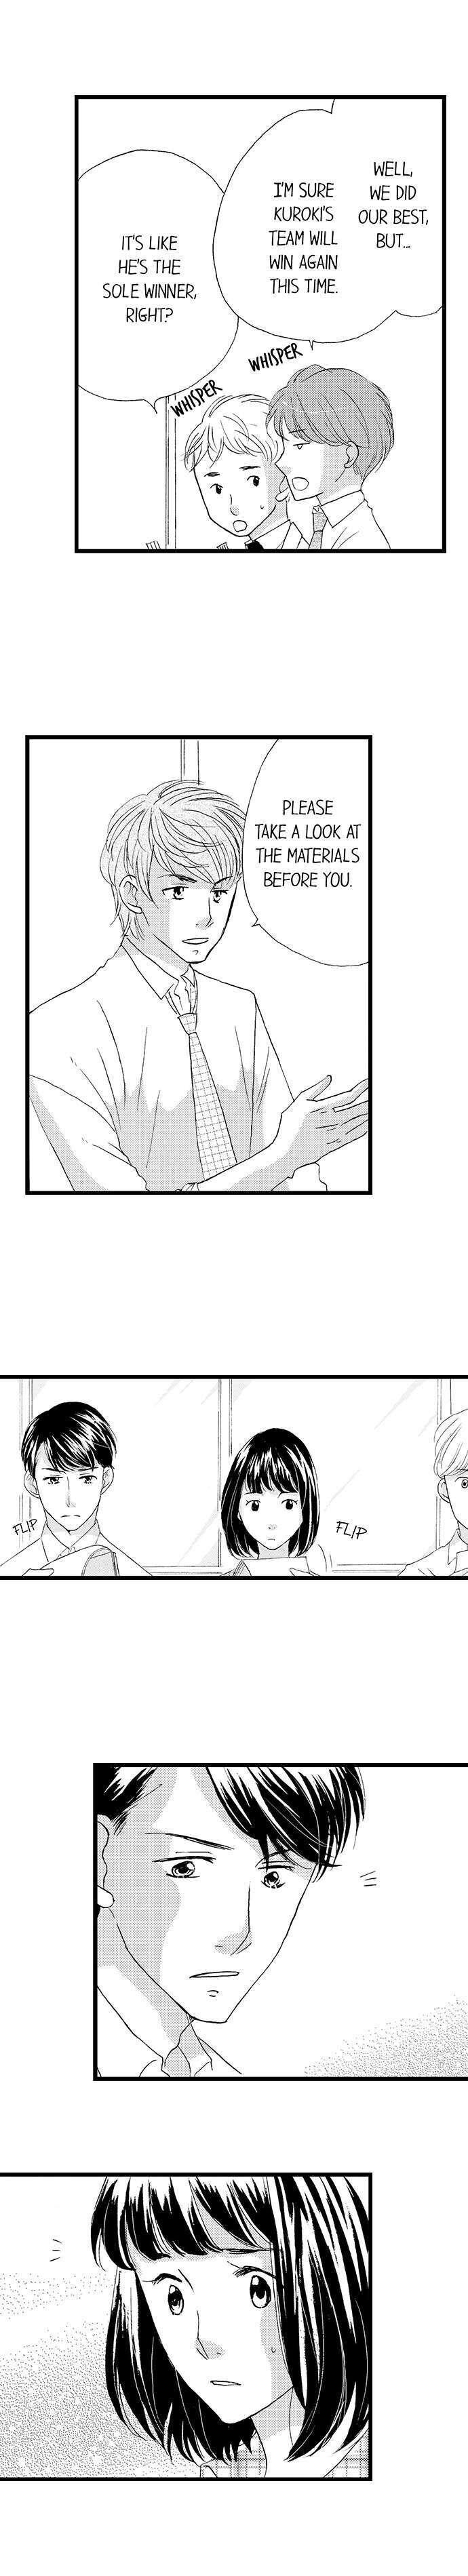 Amaku Nureru Uso Kekkon Toiu Na No Fukushu Chapter 64 page 3 - Mangakakalots.com